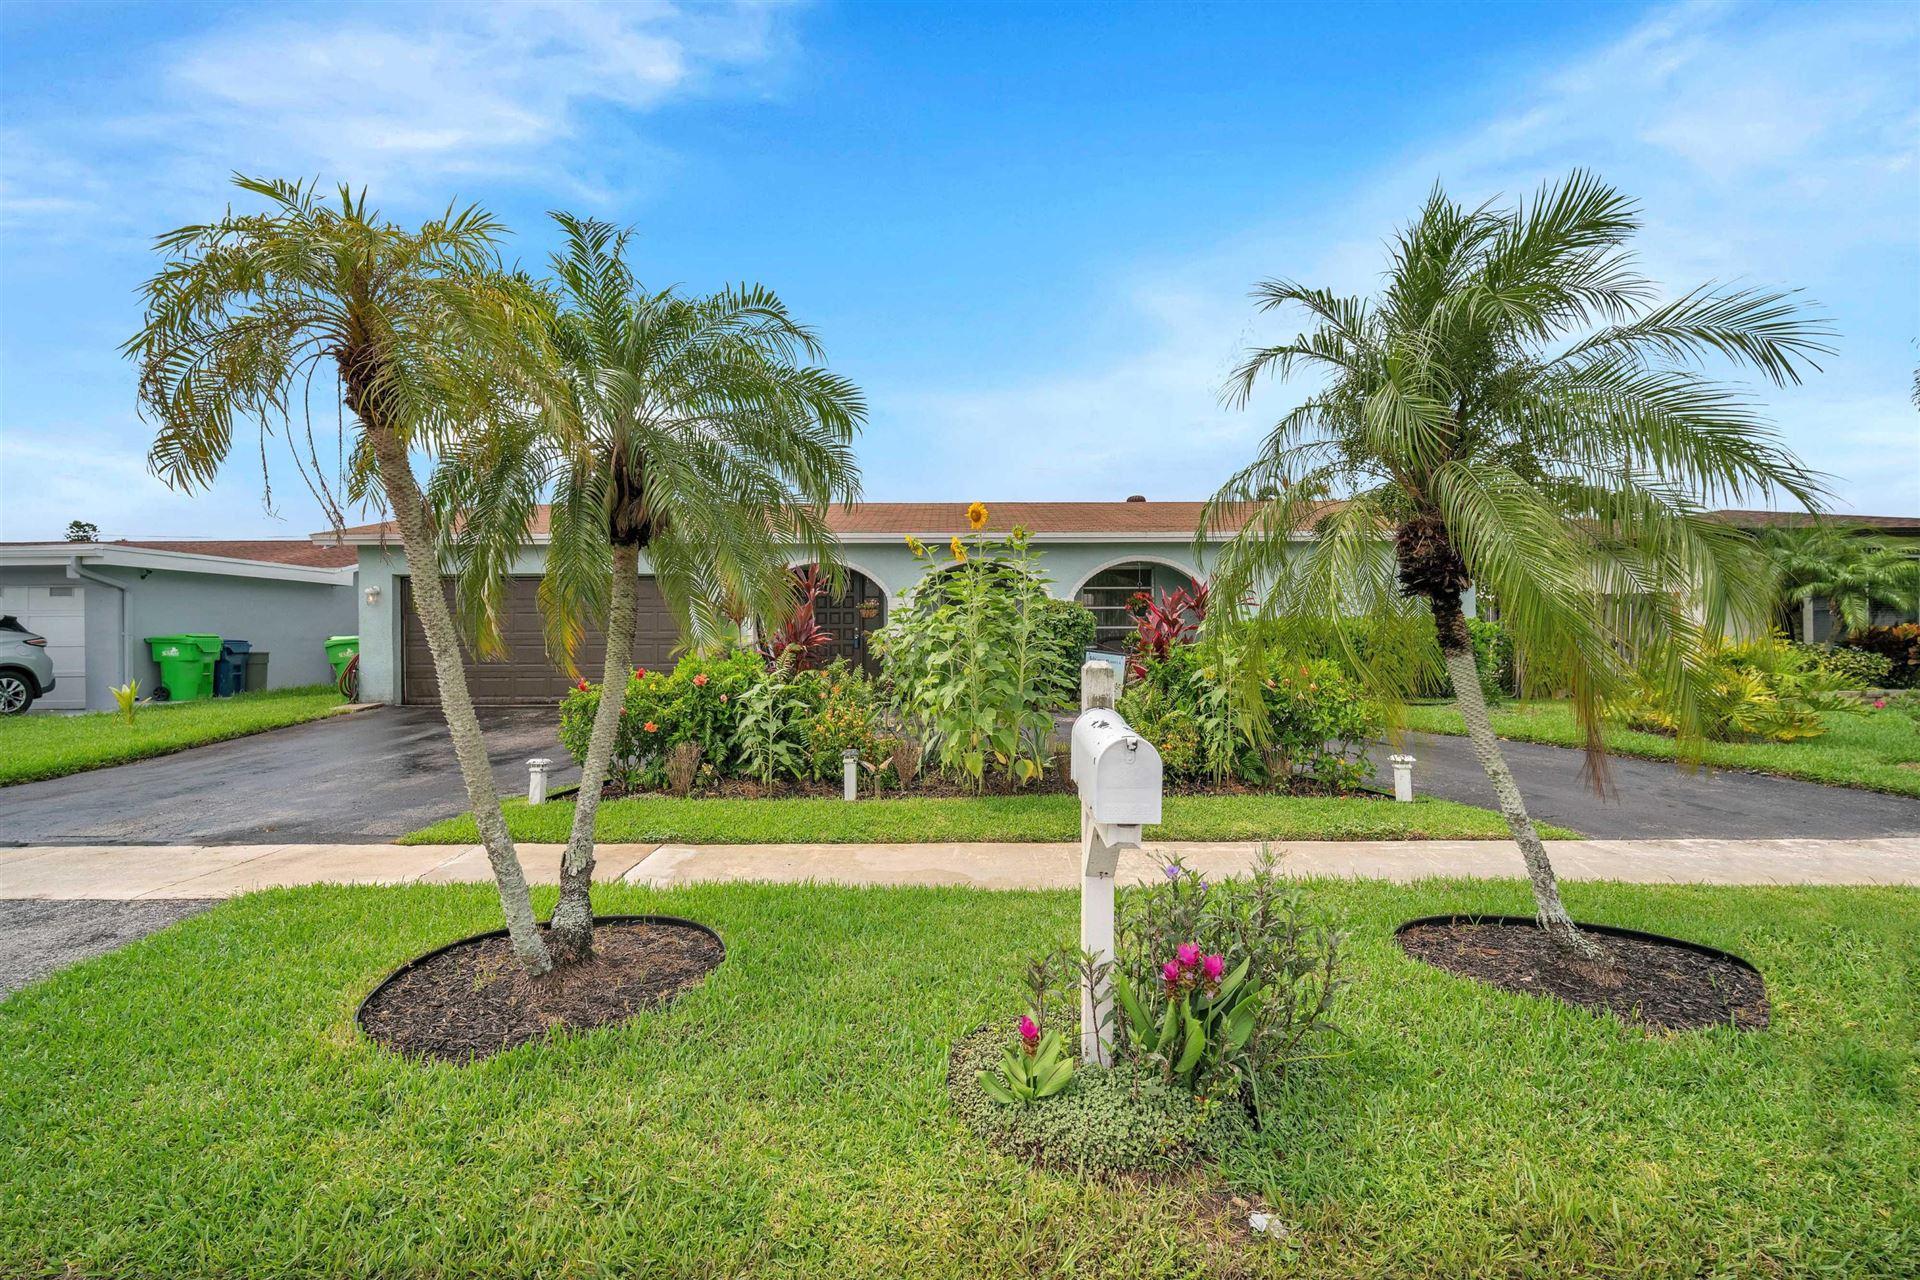 9610 NW 20th Place, Sunrise, FL 33322 - MLS#: RX-10727899